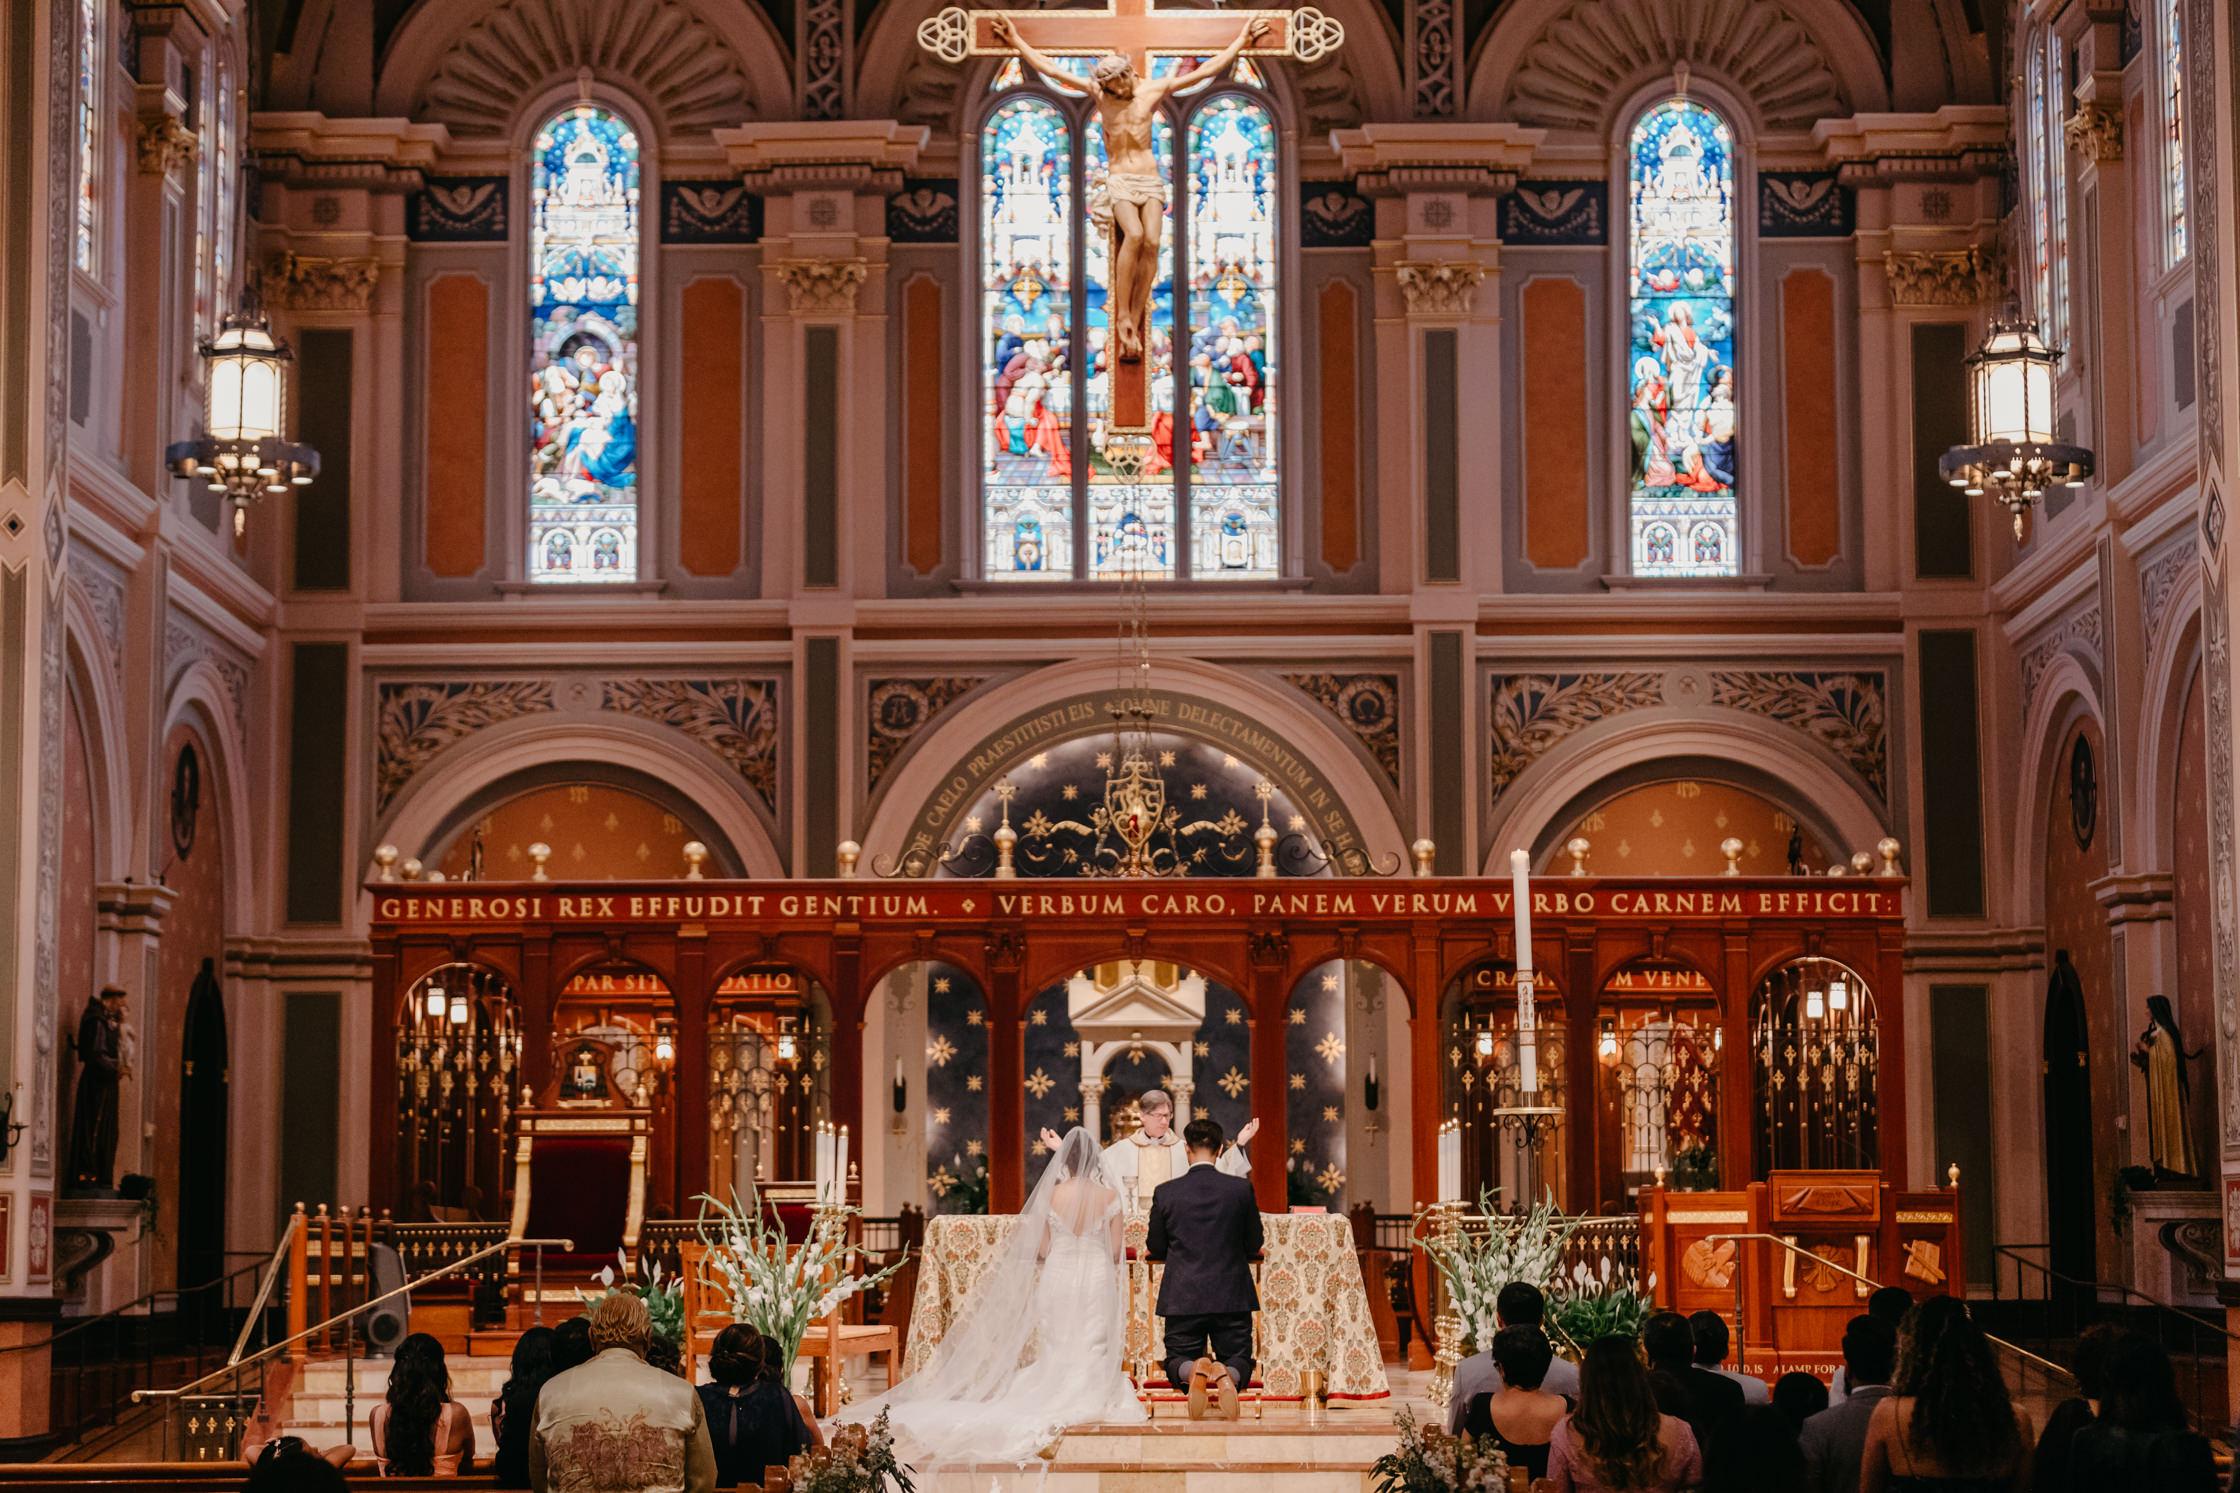 luis_joanna_wedding-35.jpg